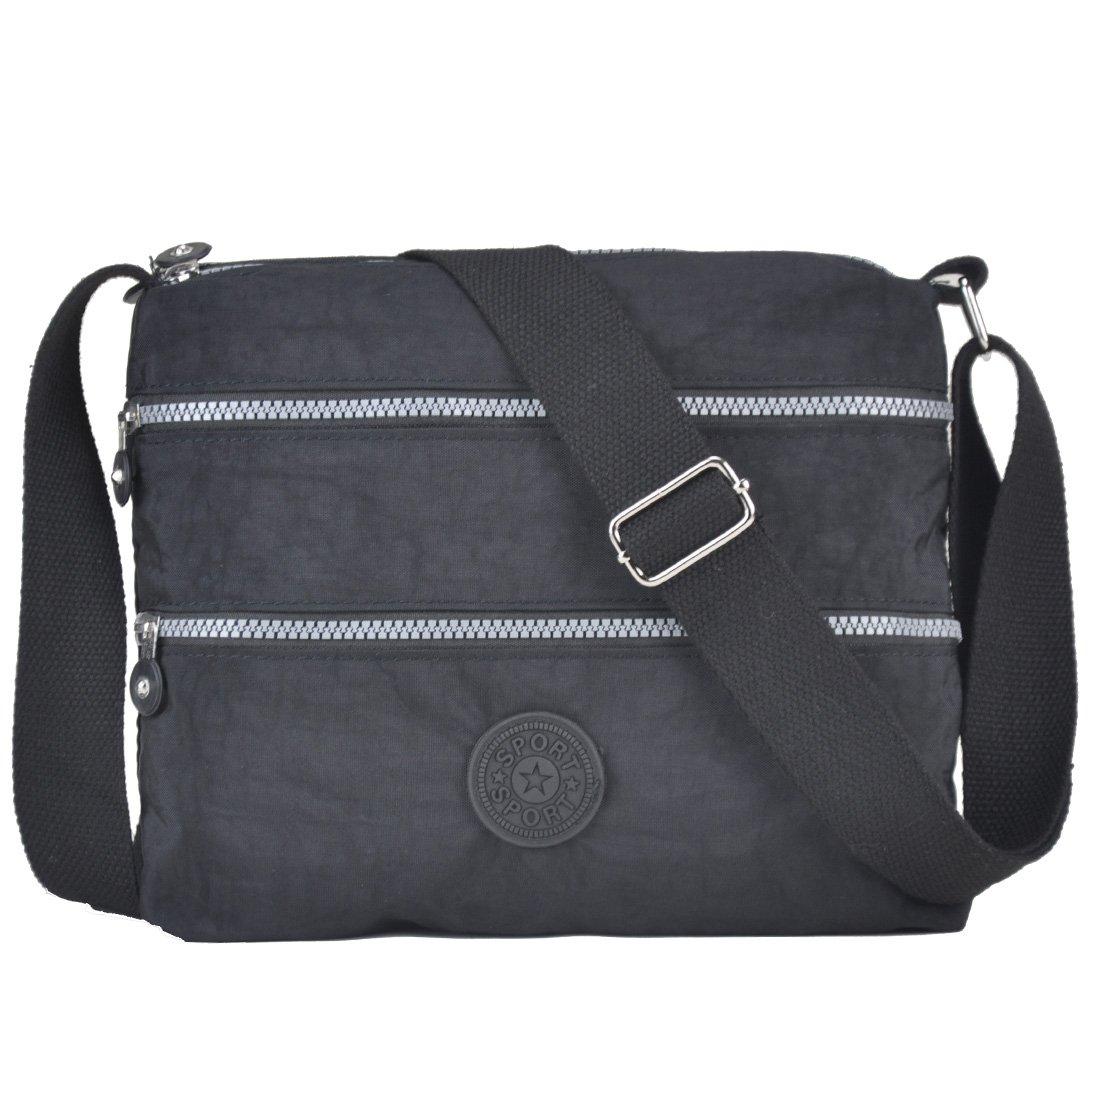 Functional Multi Roomy Pockets Crossbody Bag Volganik Rock Lightweight Nylon Waterproof Handbag